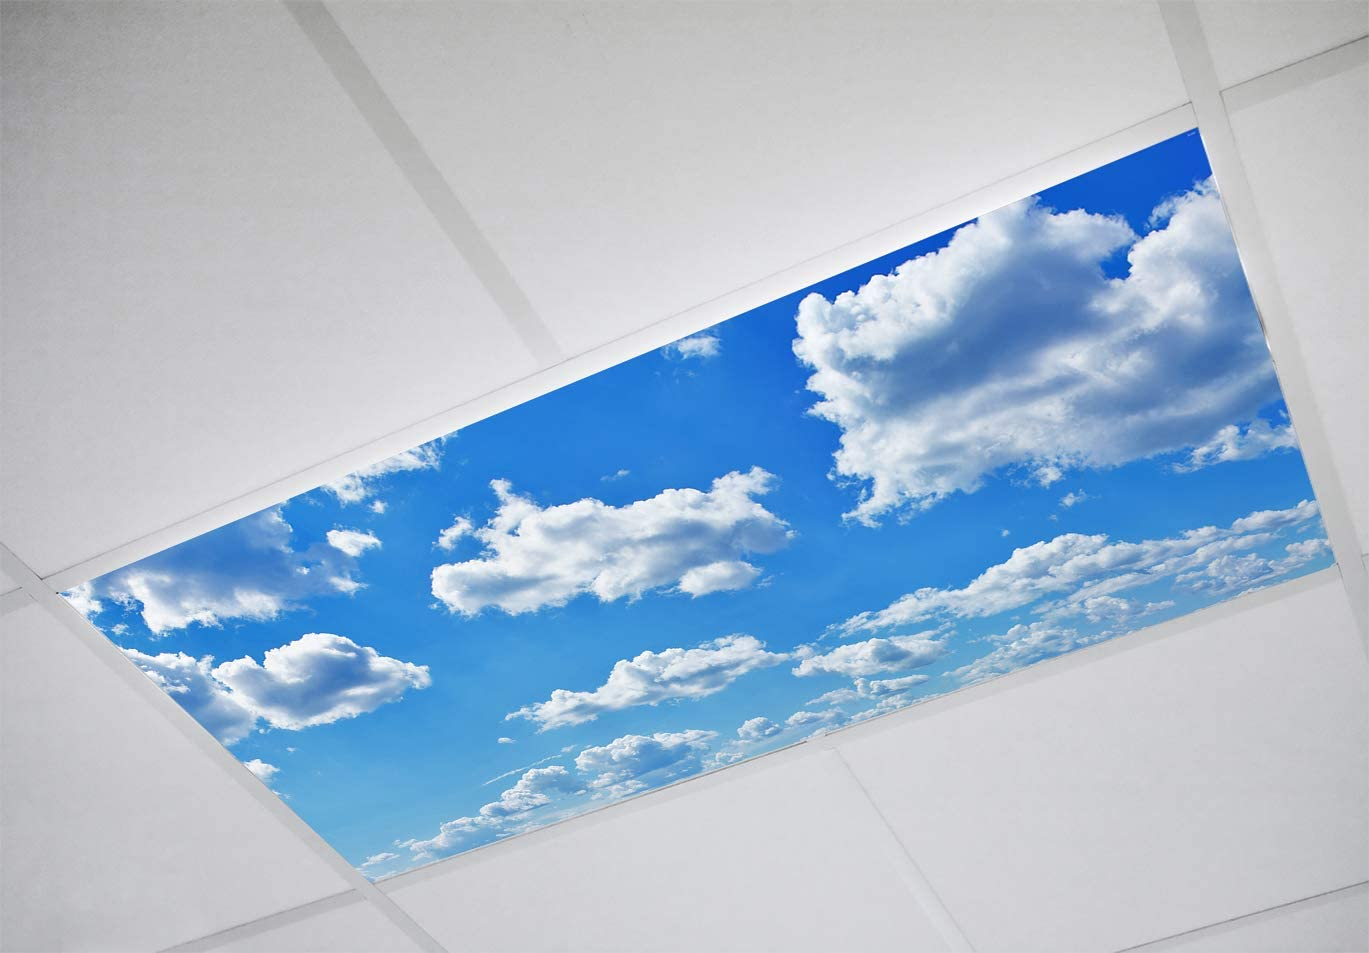 Fluorescent Light Covers - 2x4 Flexible Ceiling Light Diffuser Panels - Decorative Clouds